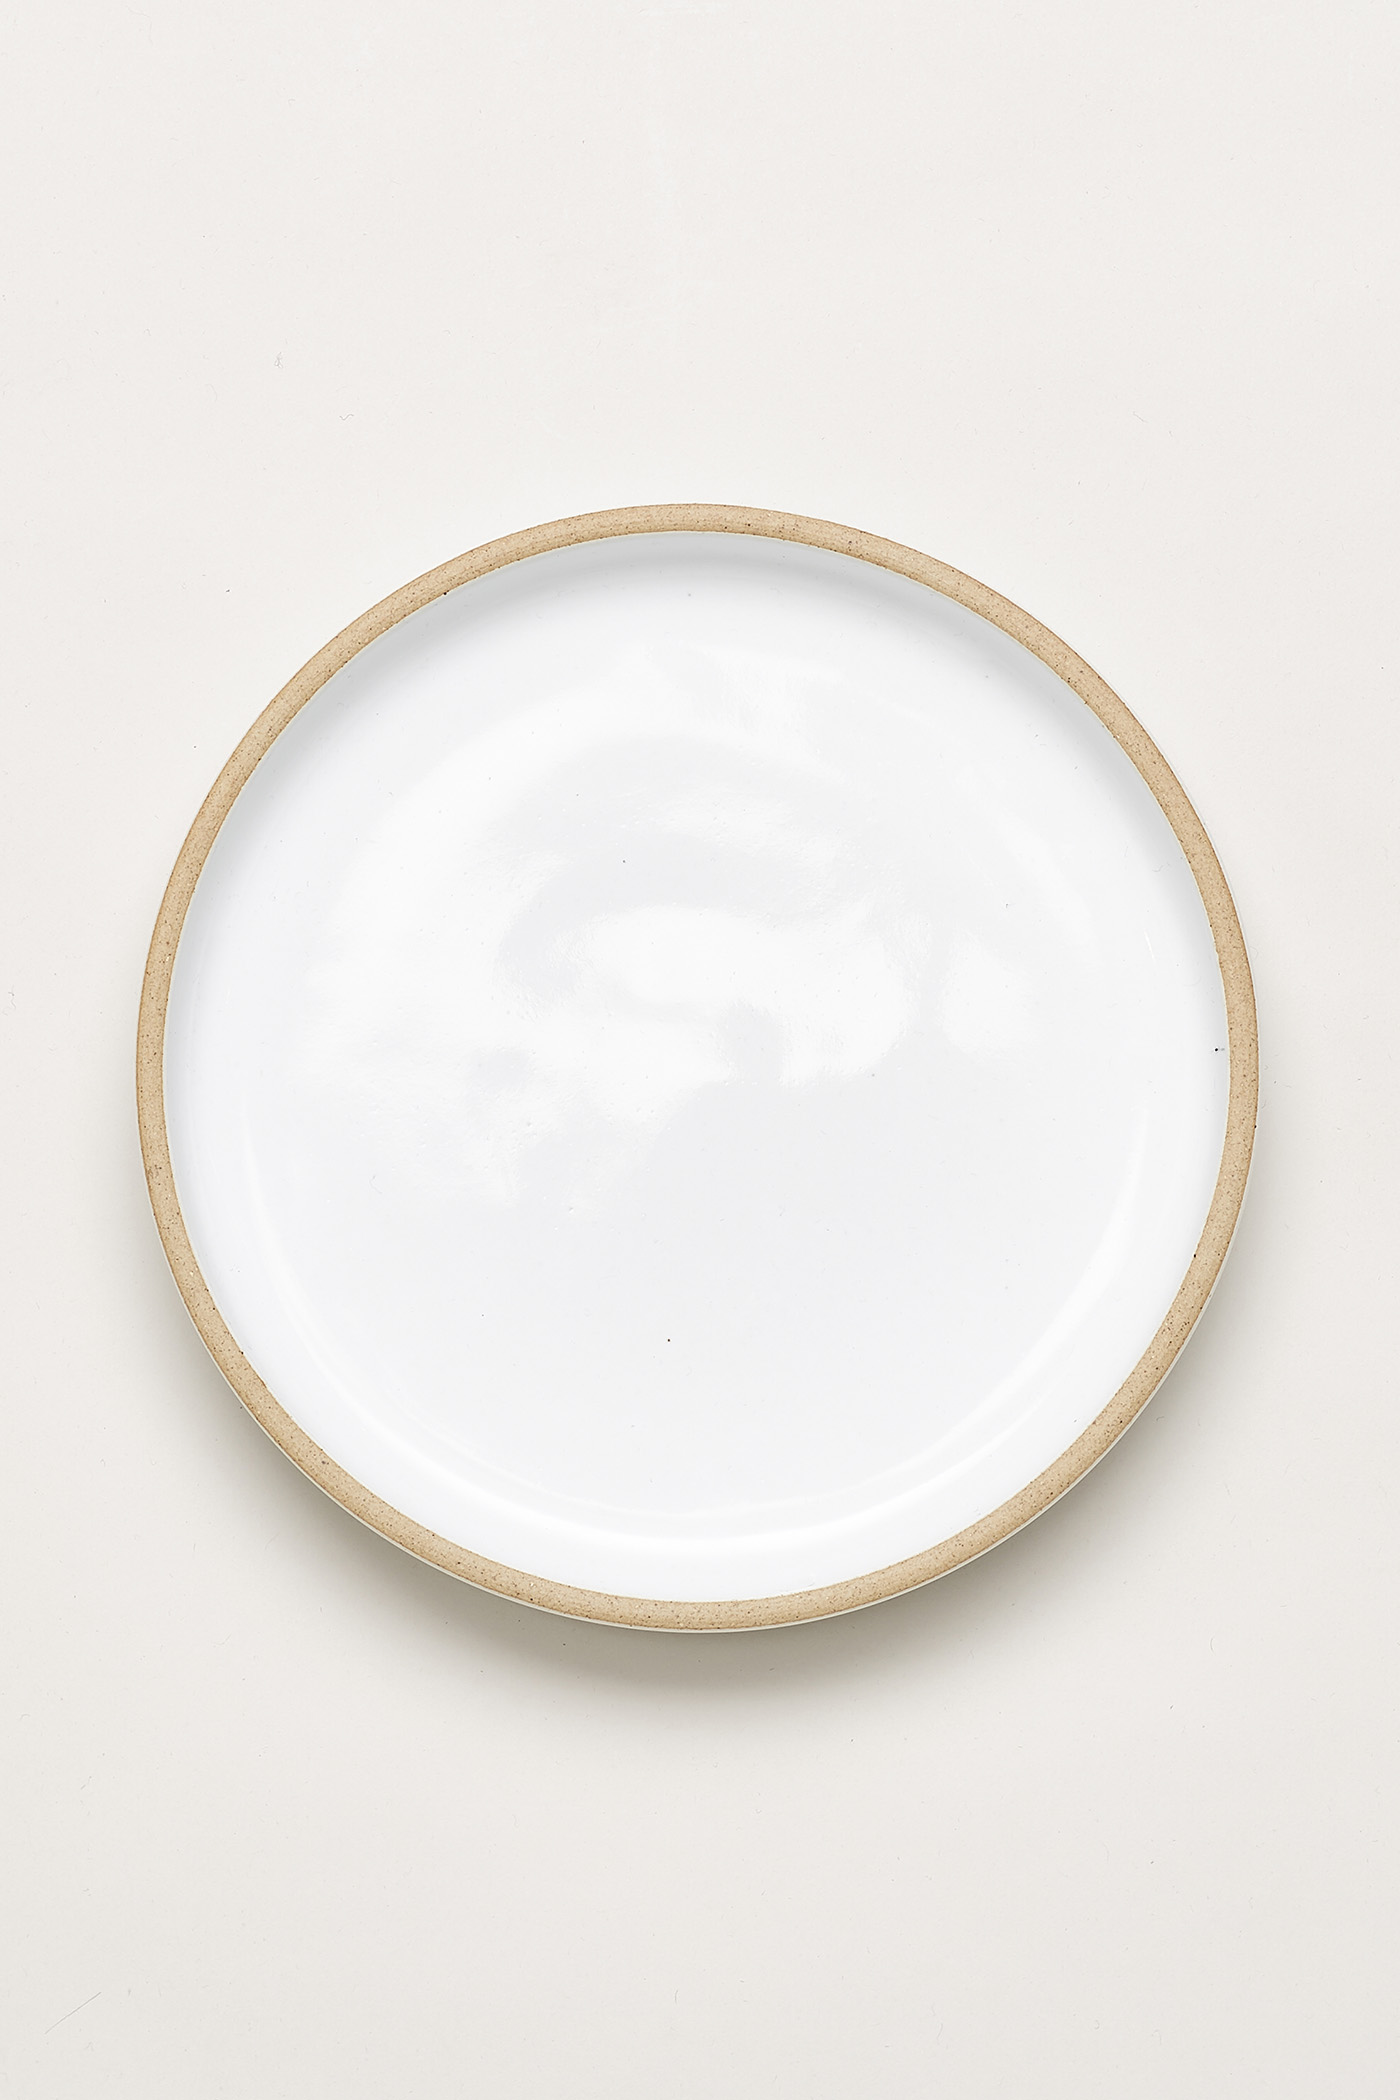 Shika Rustic Round Plate